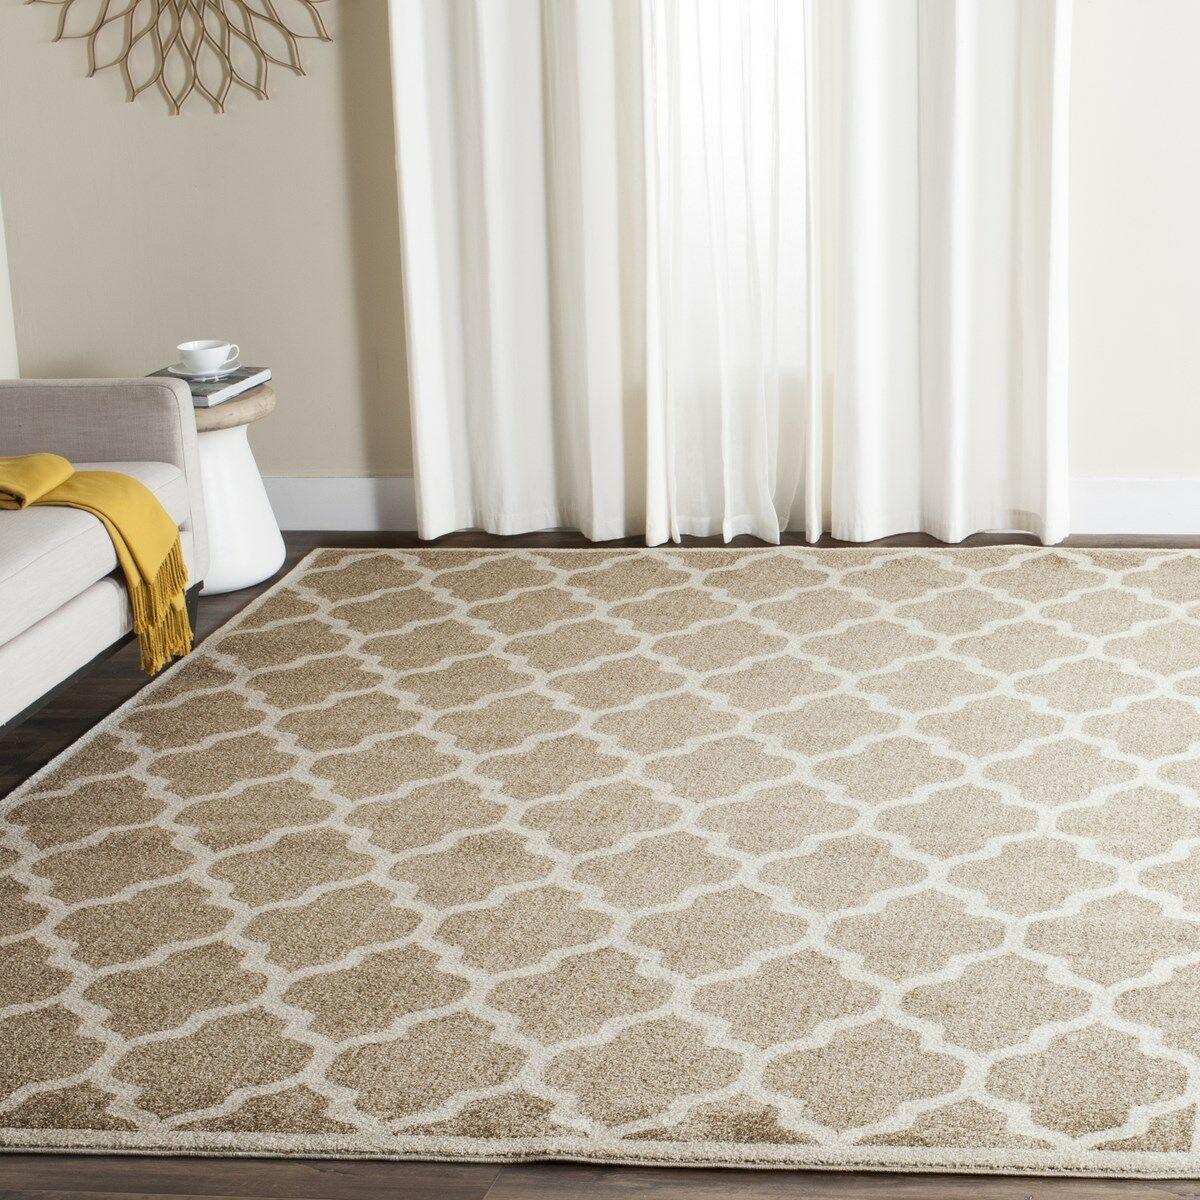 Maritza Wheat/Beige Woven Area Rug Rug Size: Rectangle 11' x 16'